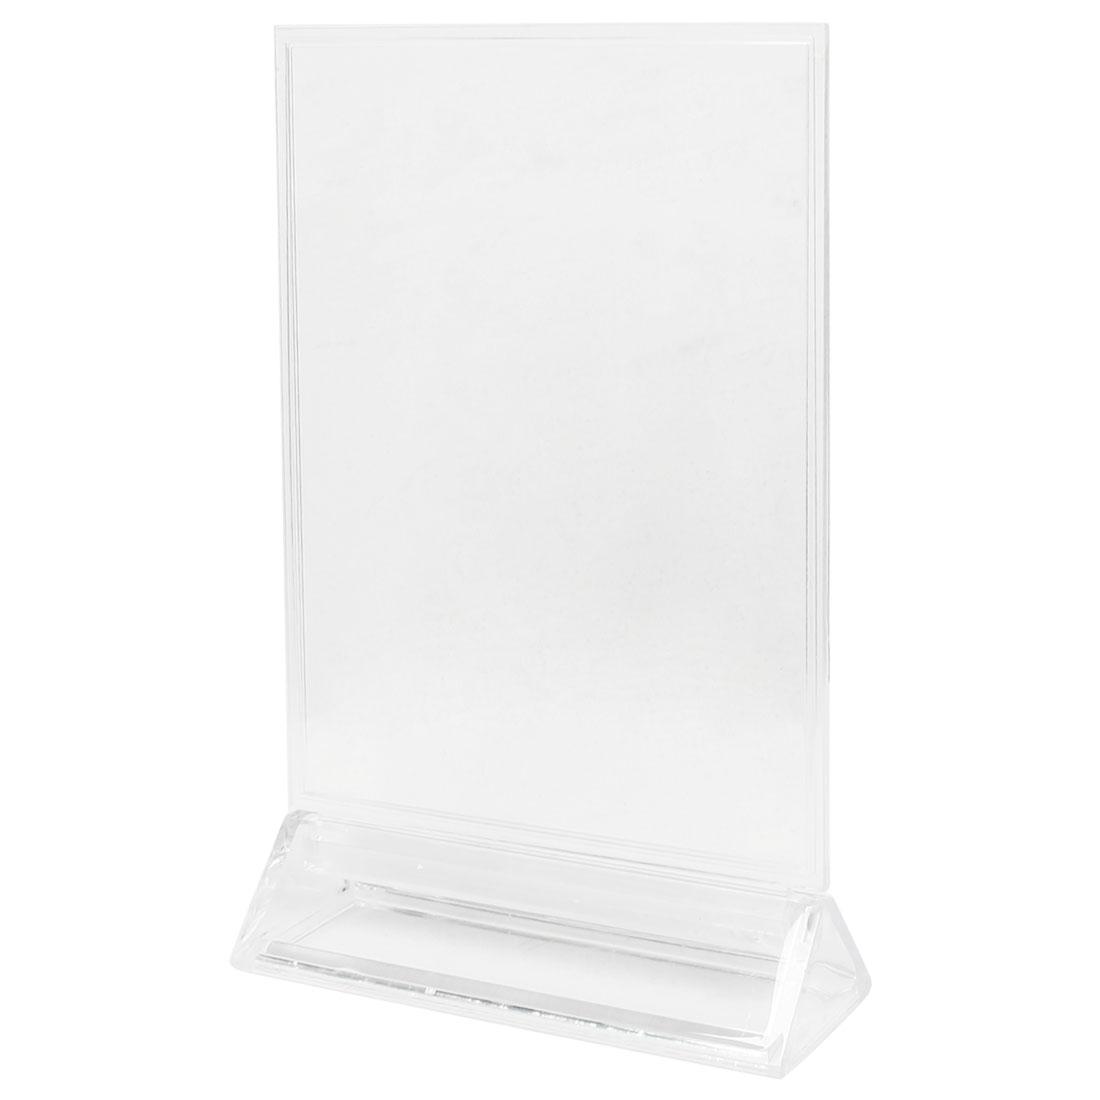 Fair Show Clear Detachable Plastic Table Display Holder 15 x 20cm